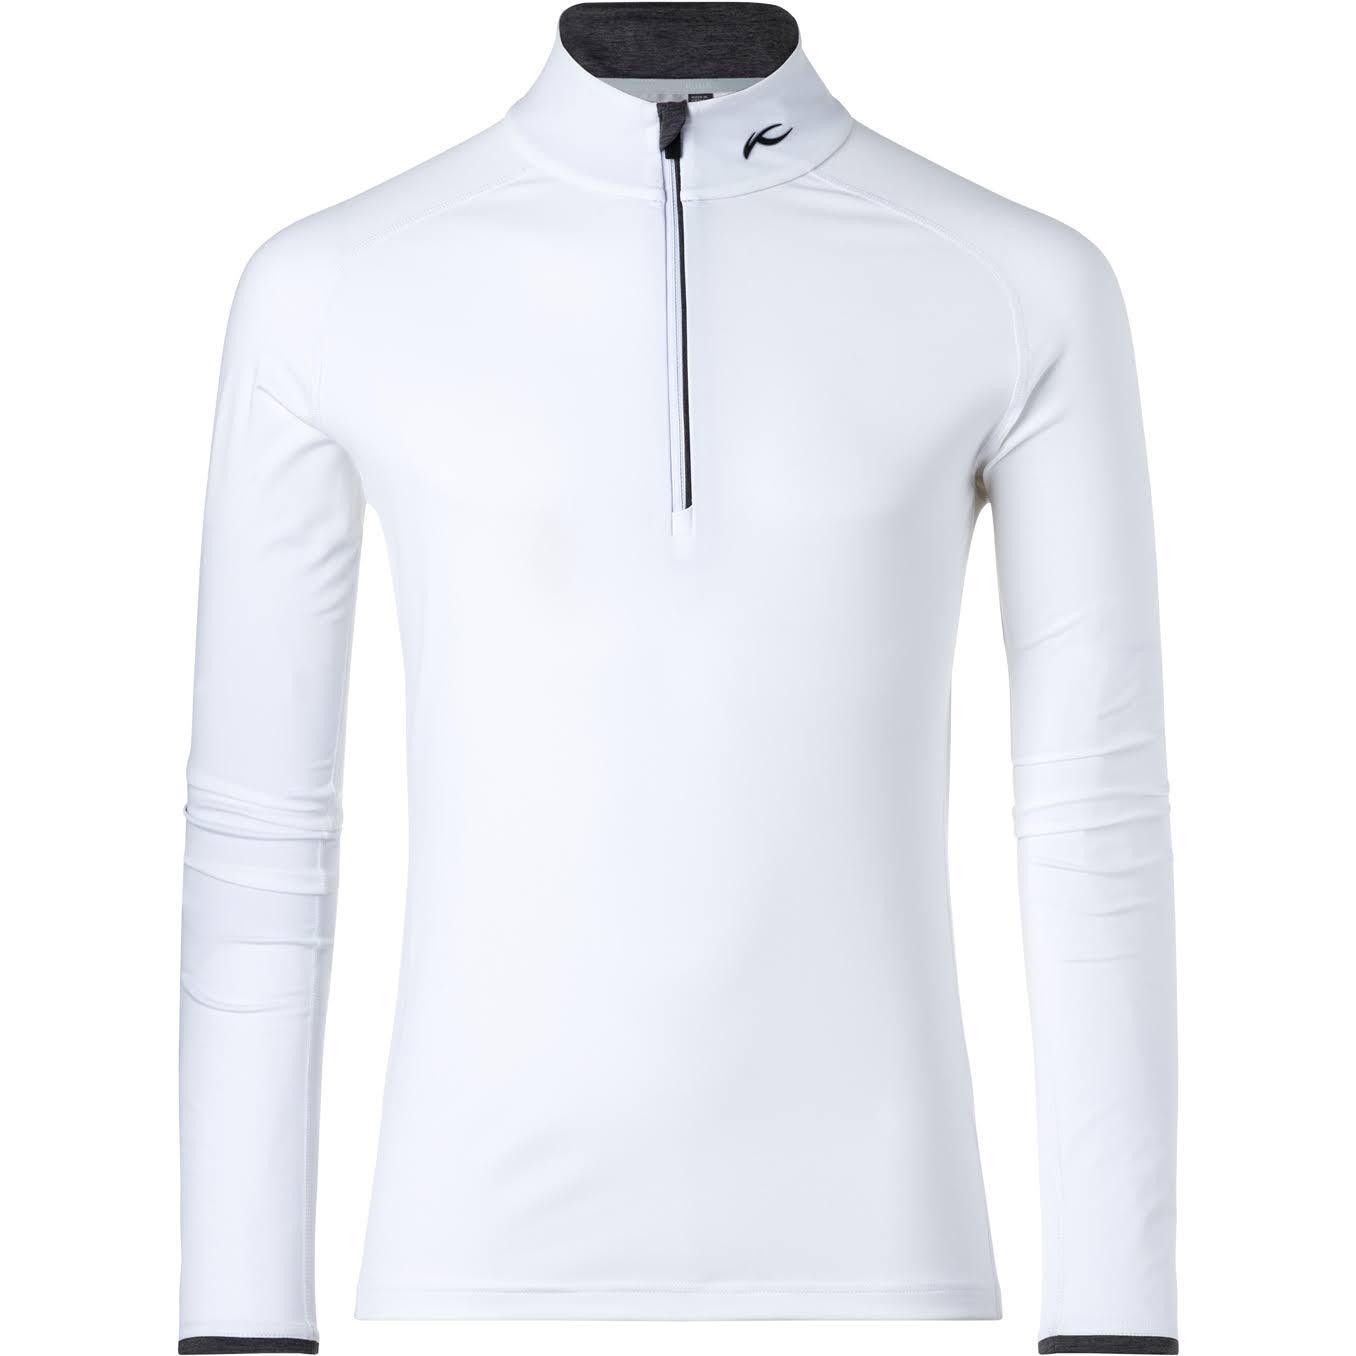 48 58 Shirt Halfzip Herren Kjus Weiß Feel wnqZHCWB